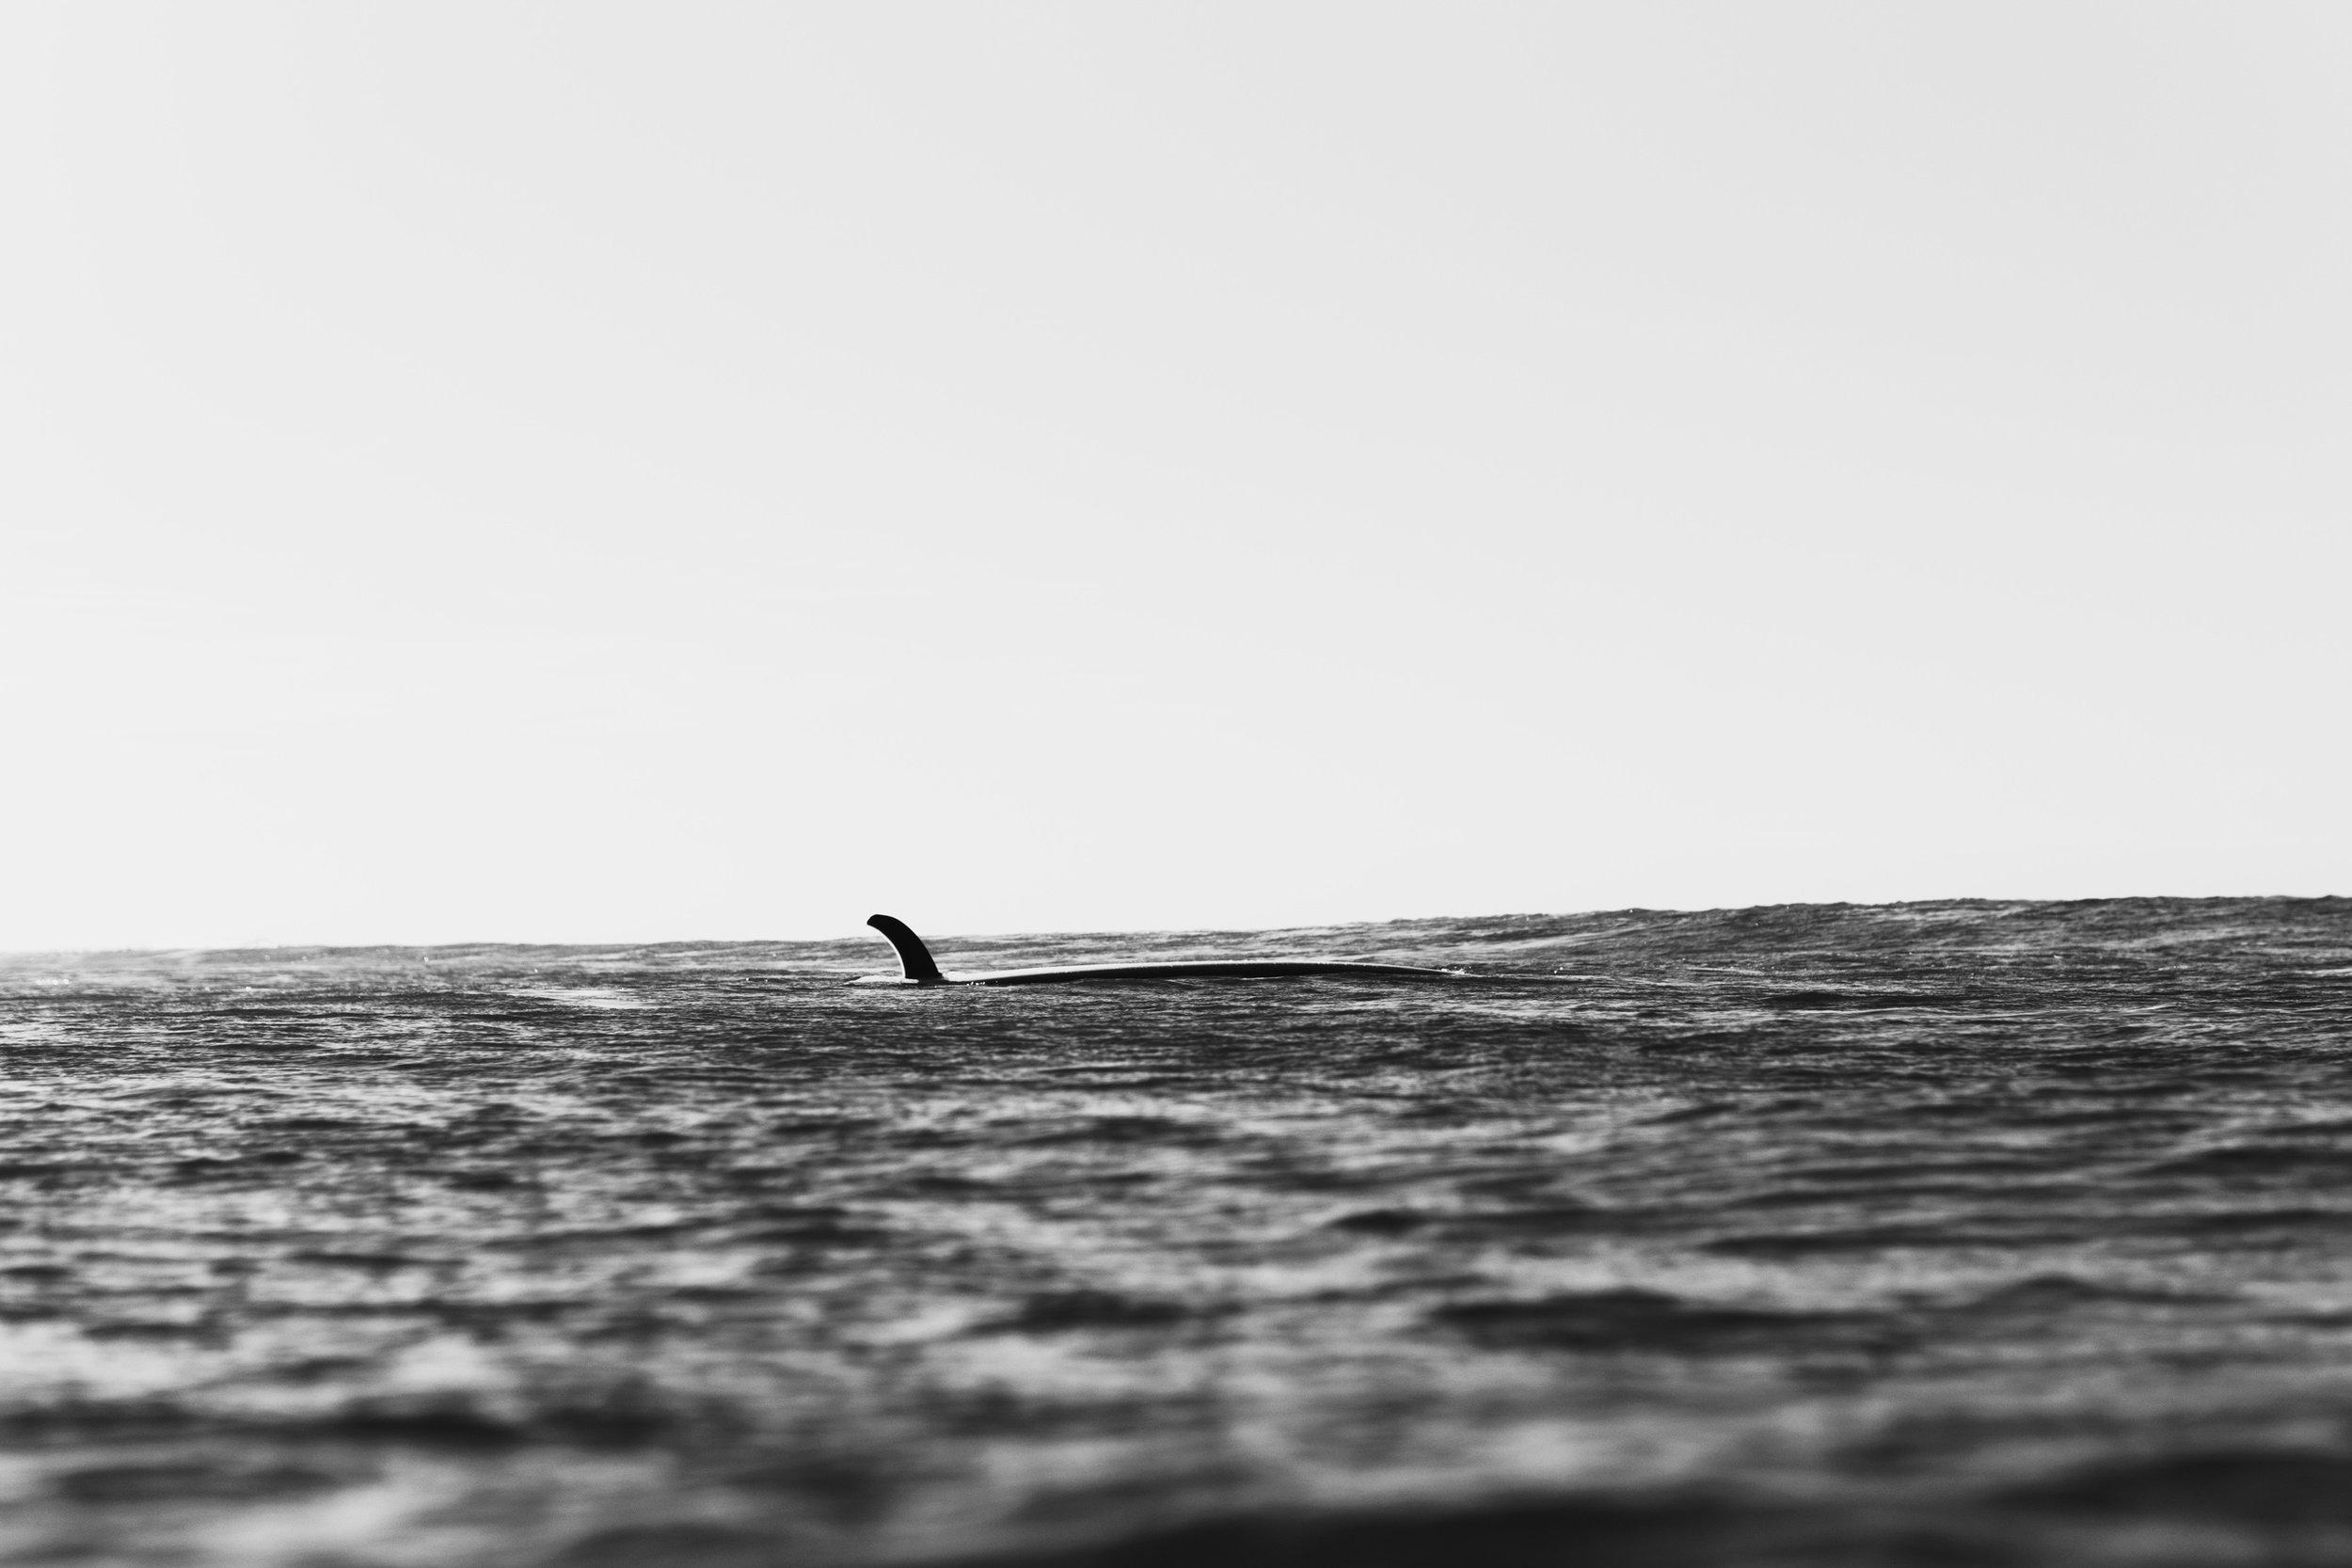 Surf-Mexico-Zihuatanejo-Sayulita-Ixtapa-Zihuatanejo-Diego-Cadena-Olas-Fotografia-Heiko-Bothe-9.jpg